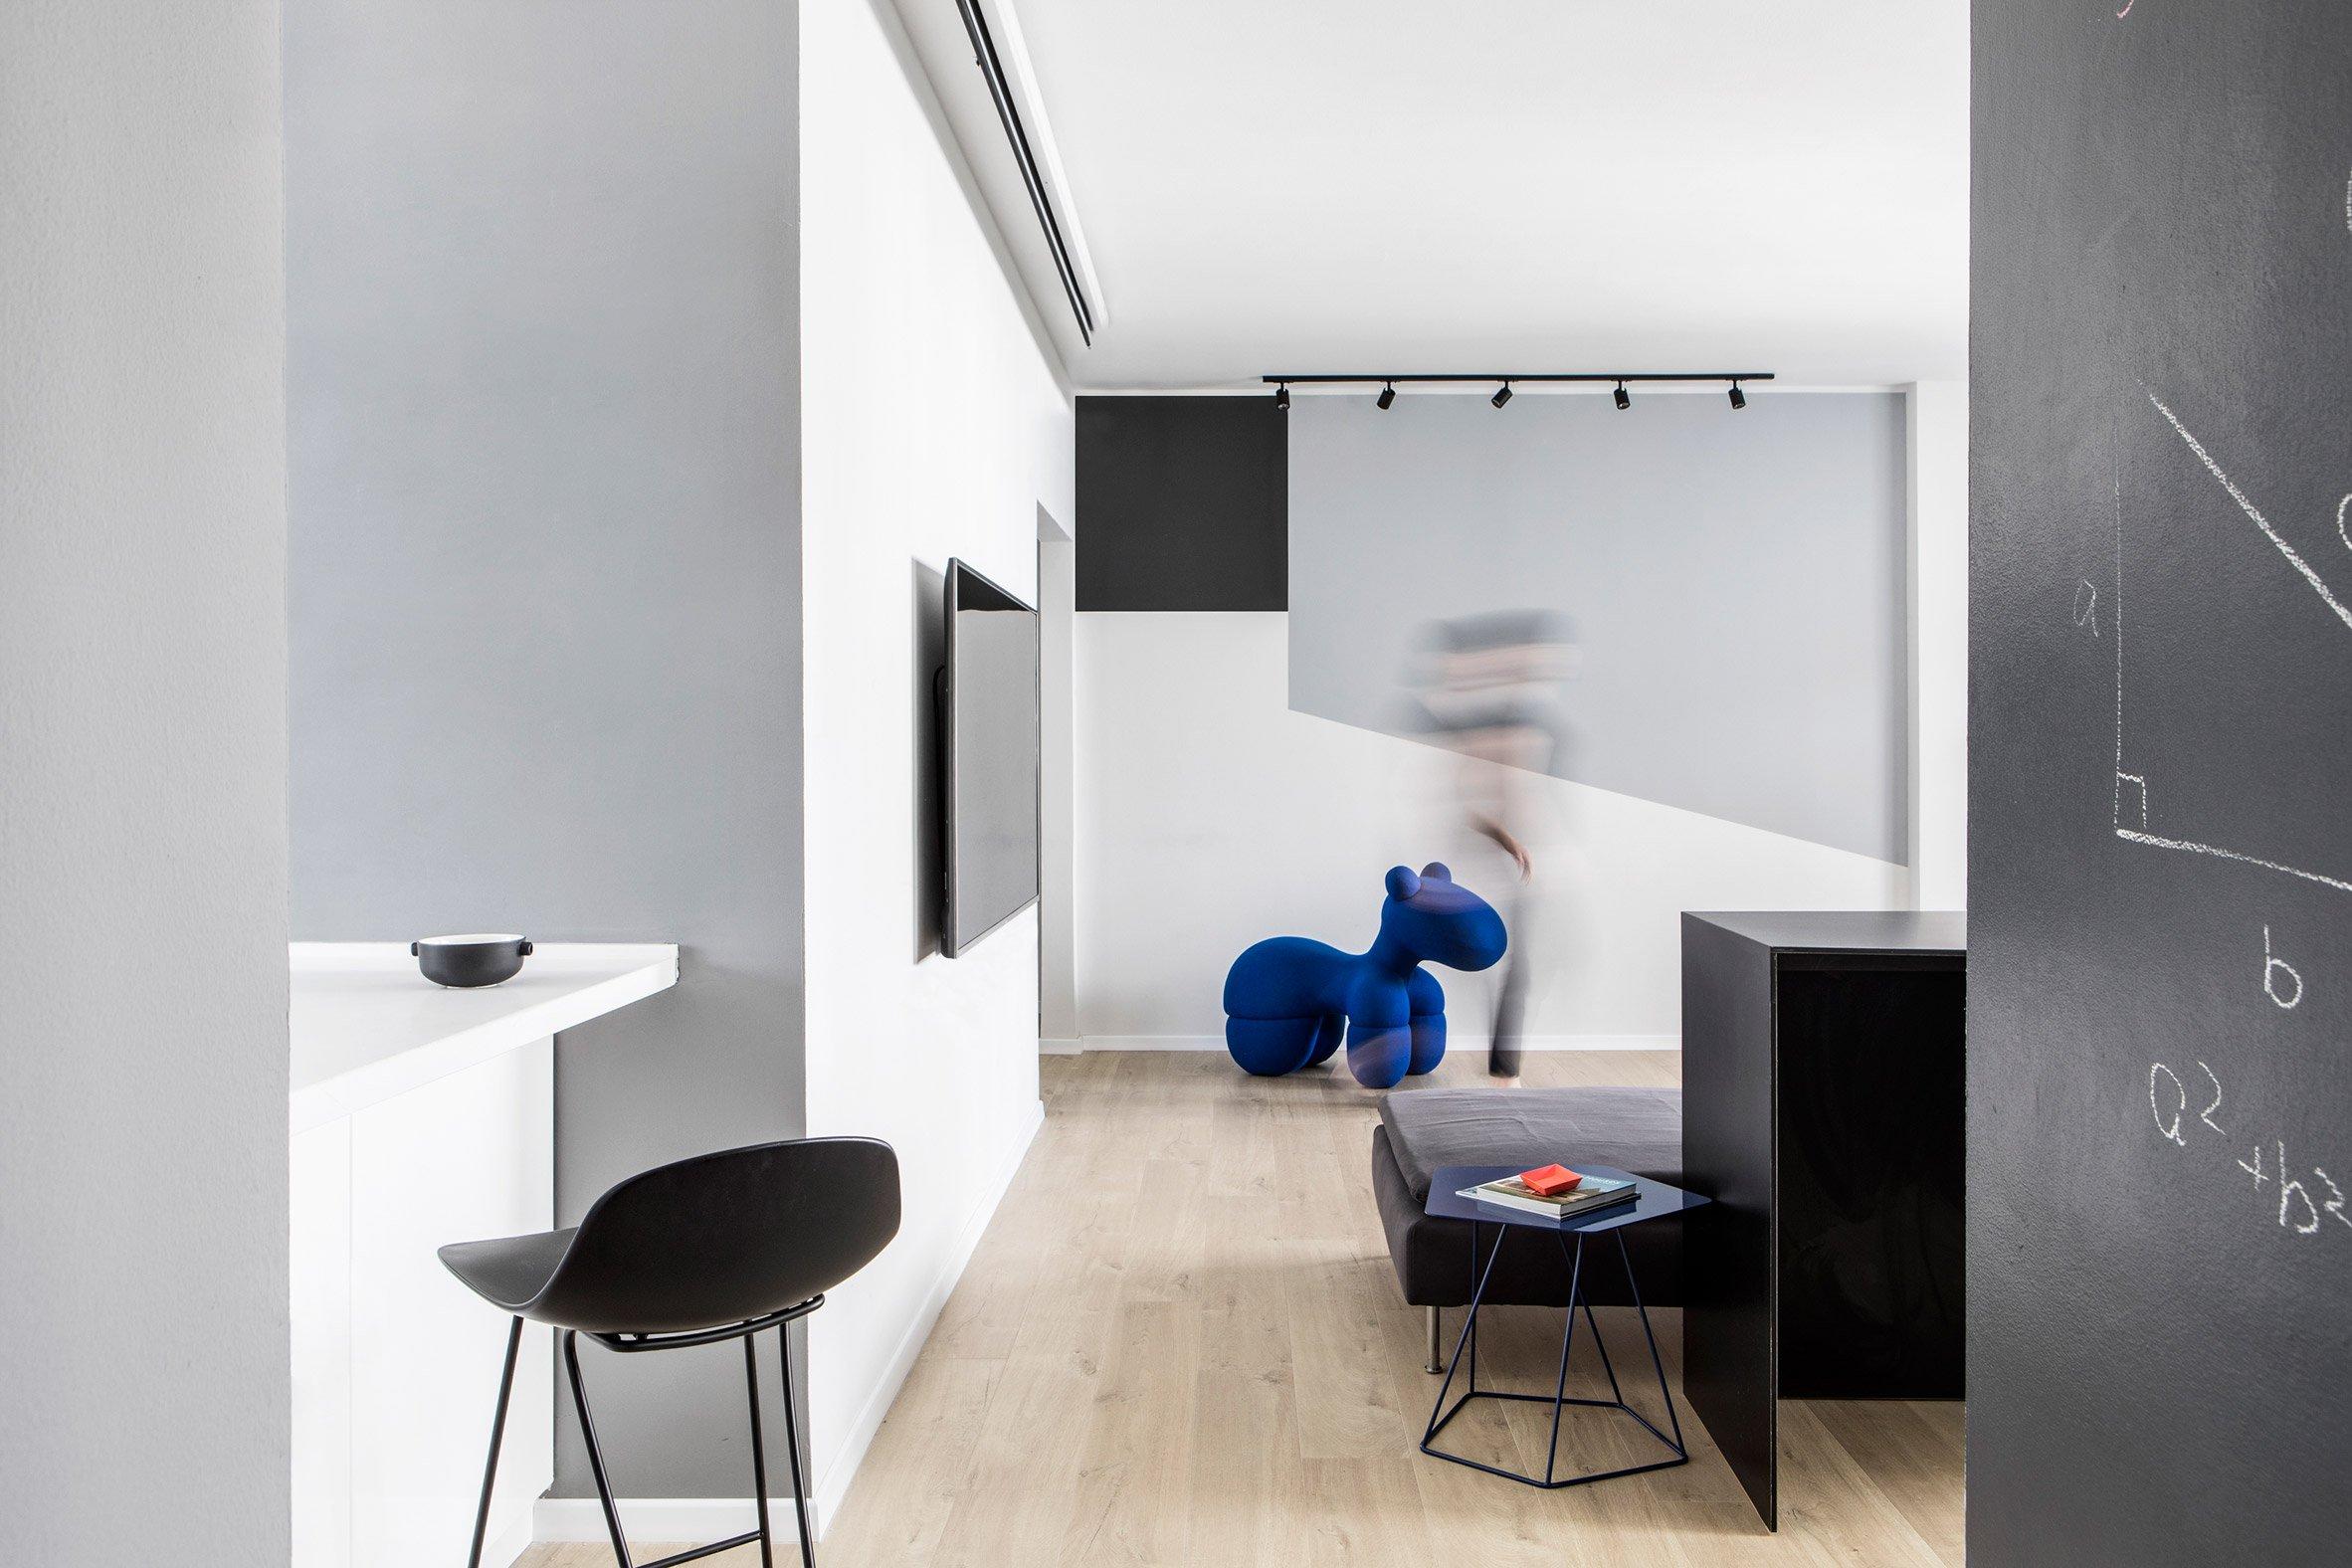 residence-interiors-design-studia-osnovadesign-osnova-poltava_02